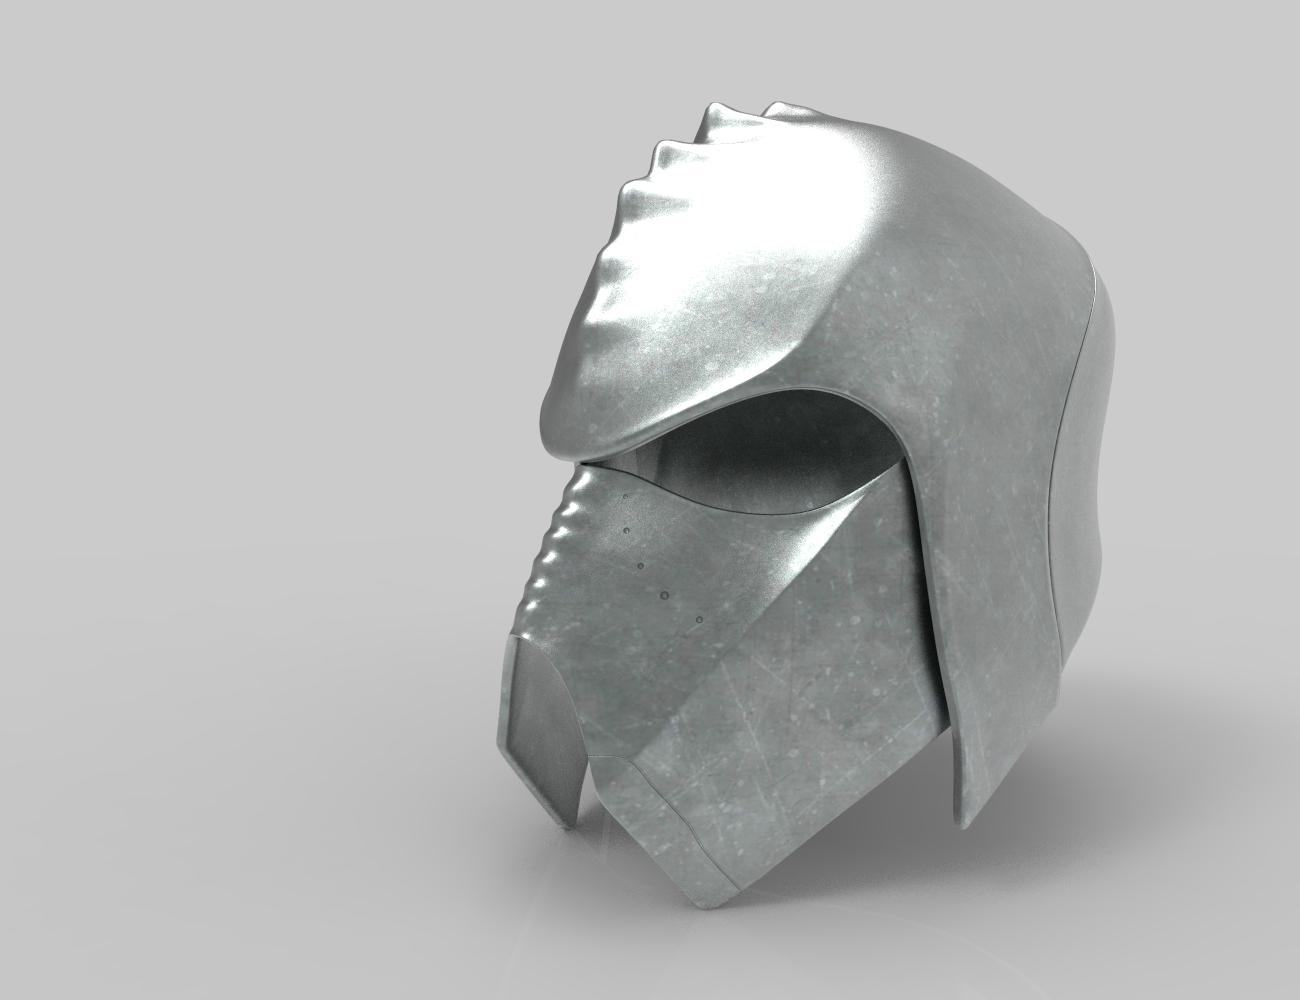 render_klingon_color.49.jpg Download STL file Klingon guard helmet • 3D printer object, 3D-mon